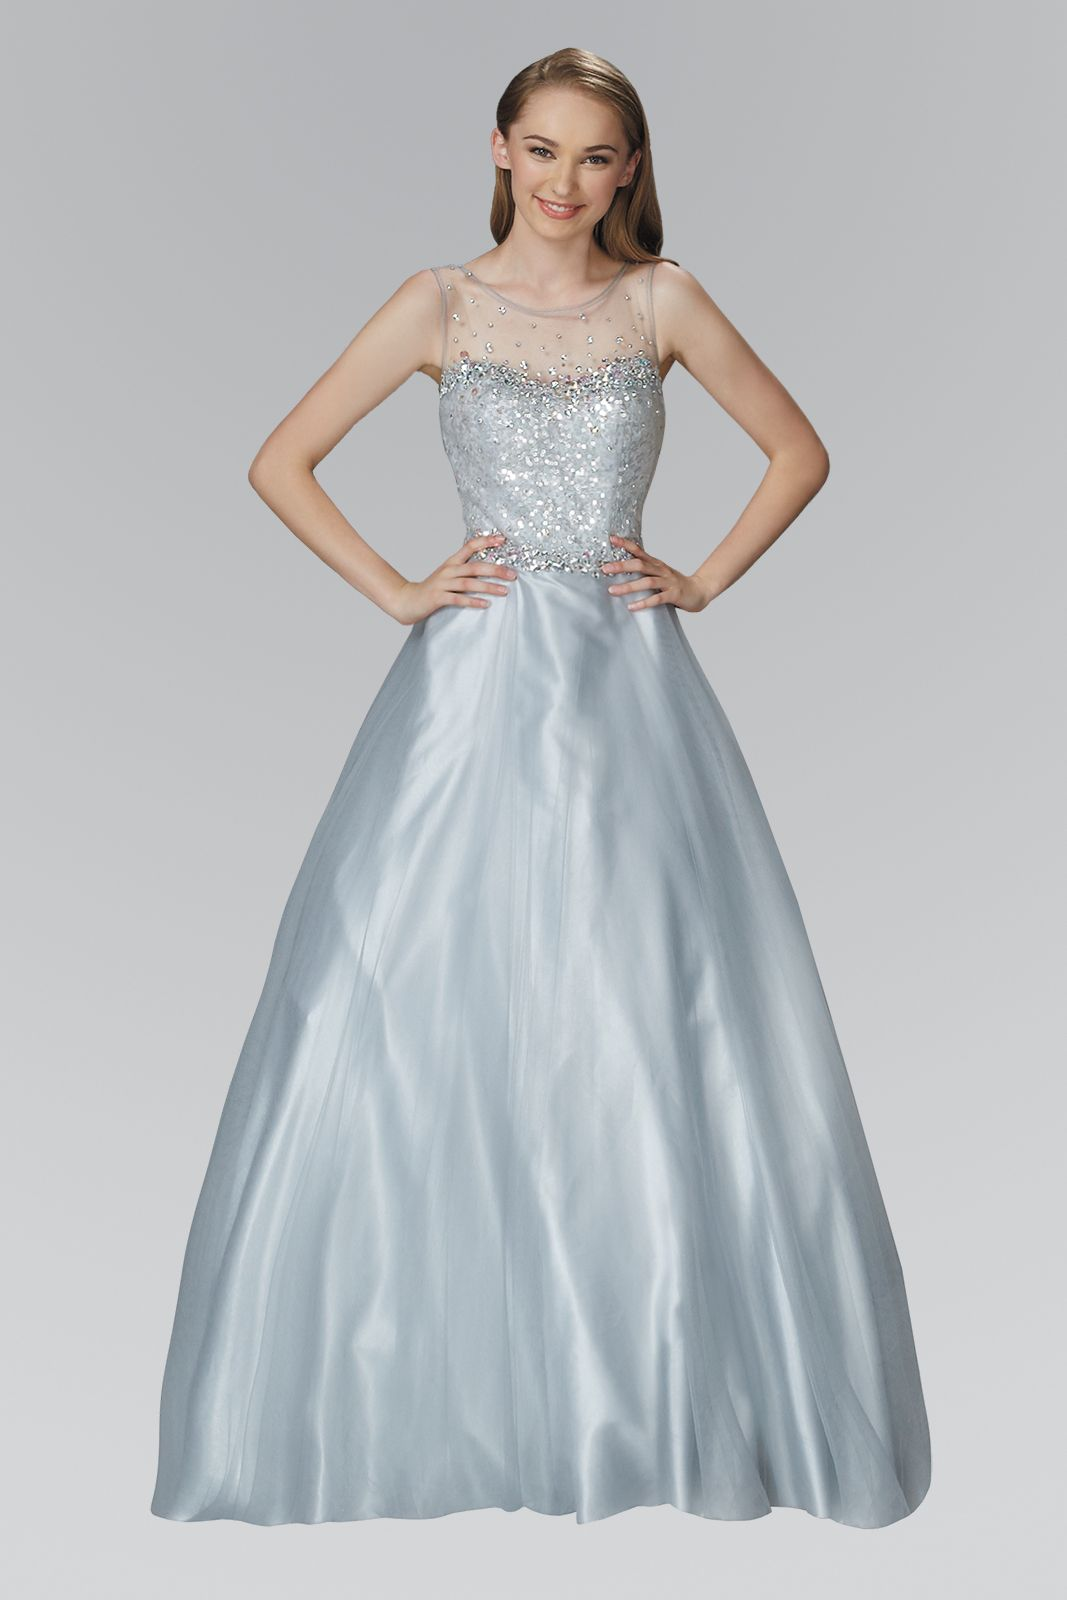 GLS APPAREL USA, INC - Dress Wholesale | Formal gowns | Pinterest ...